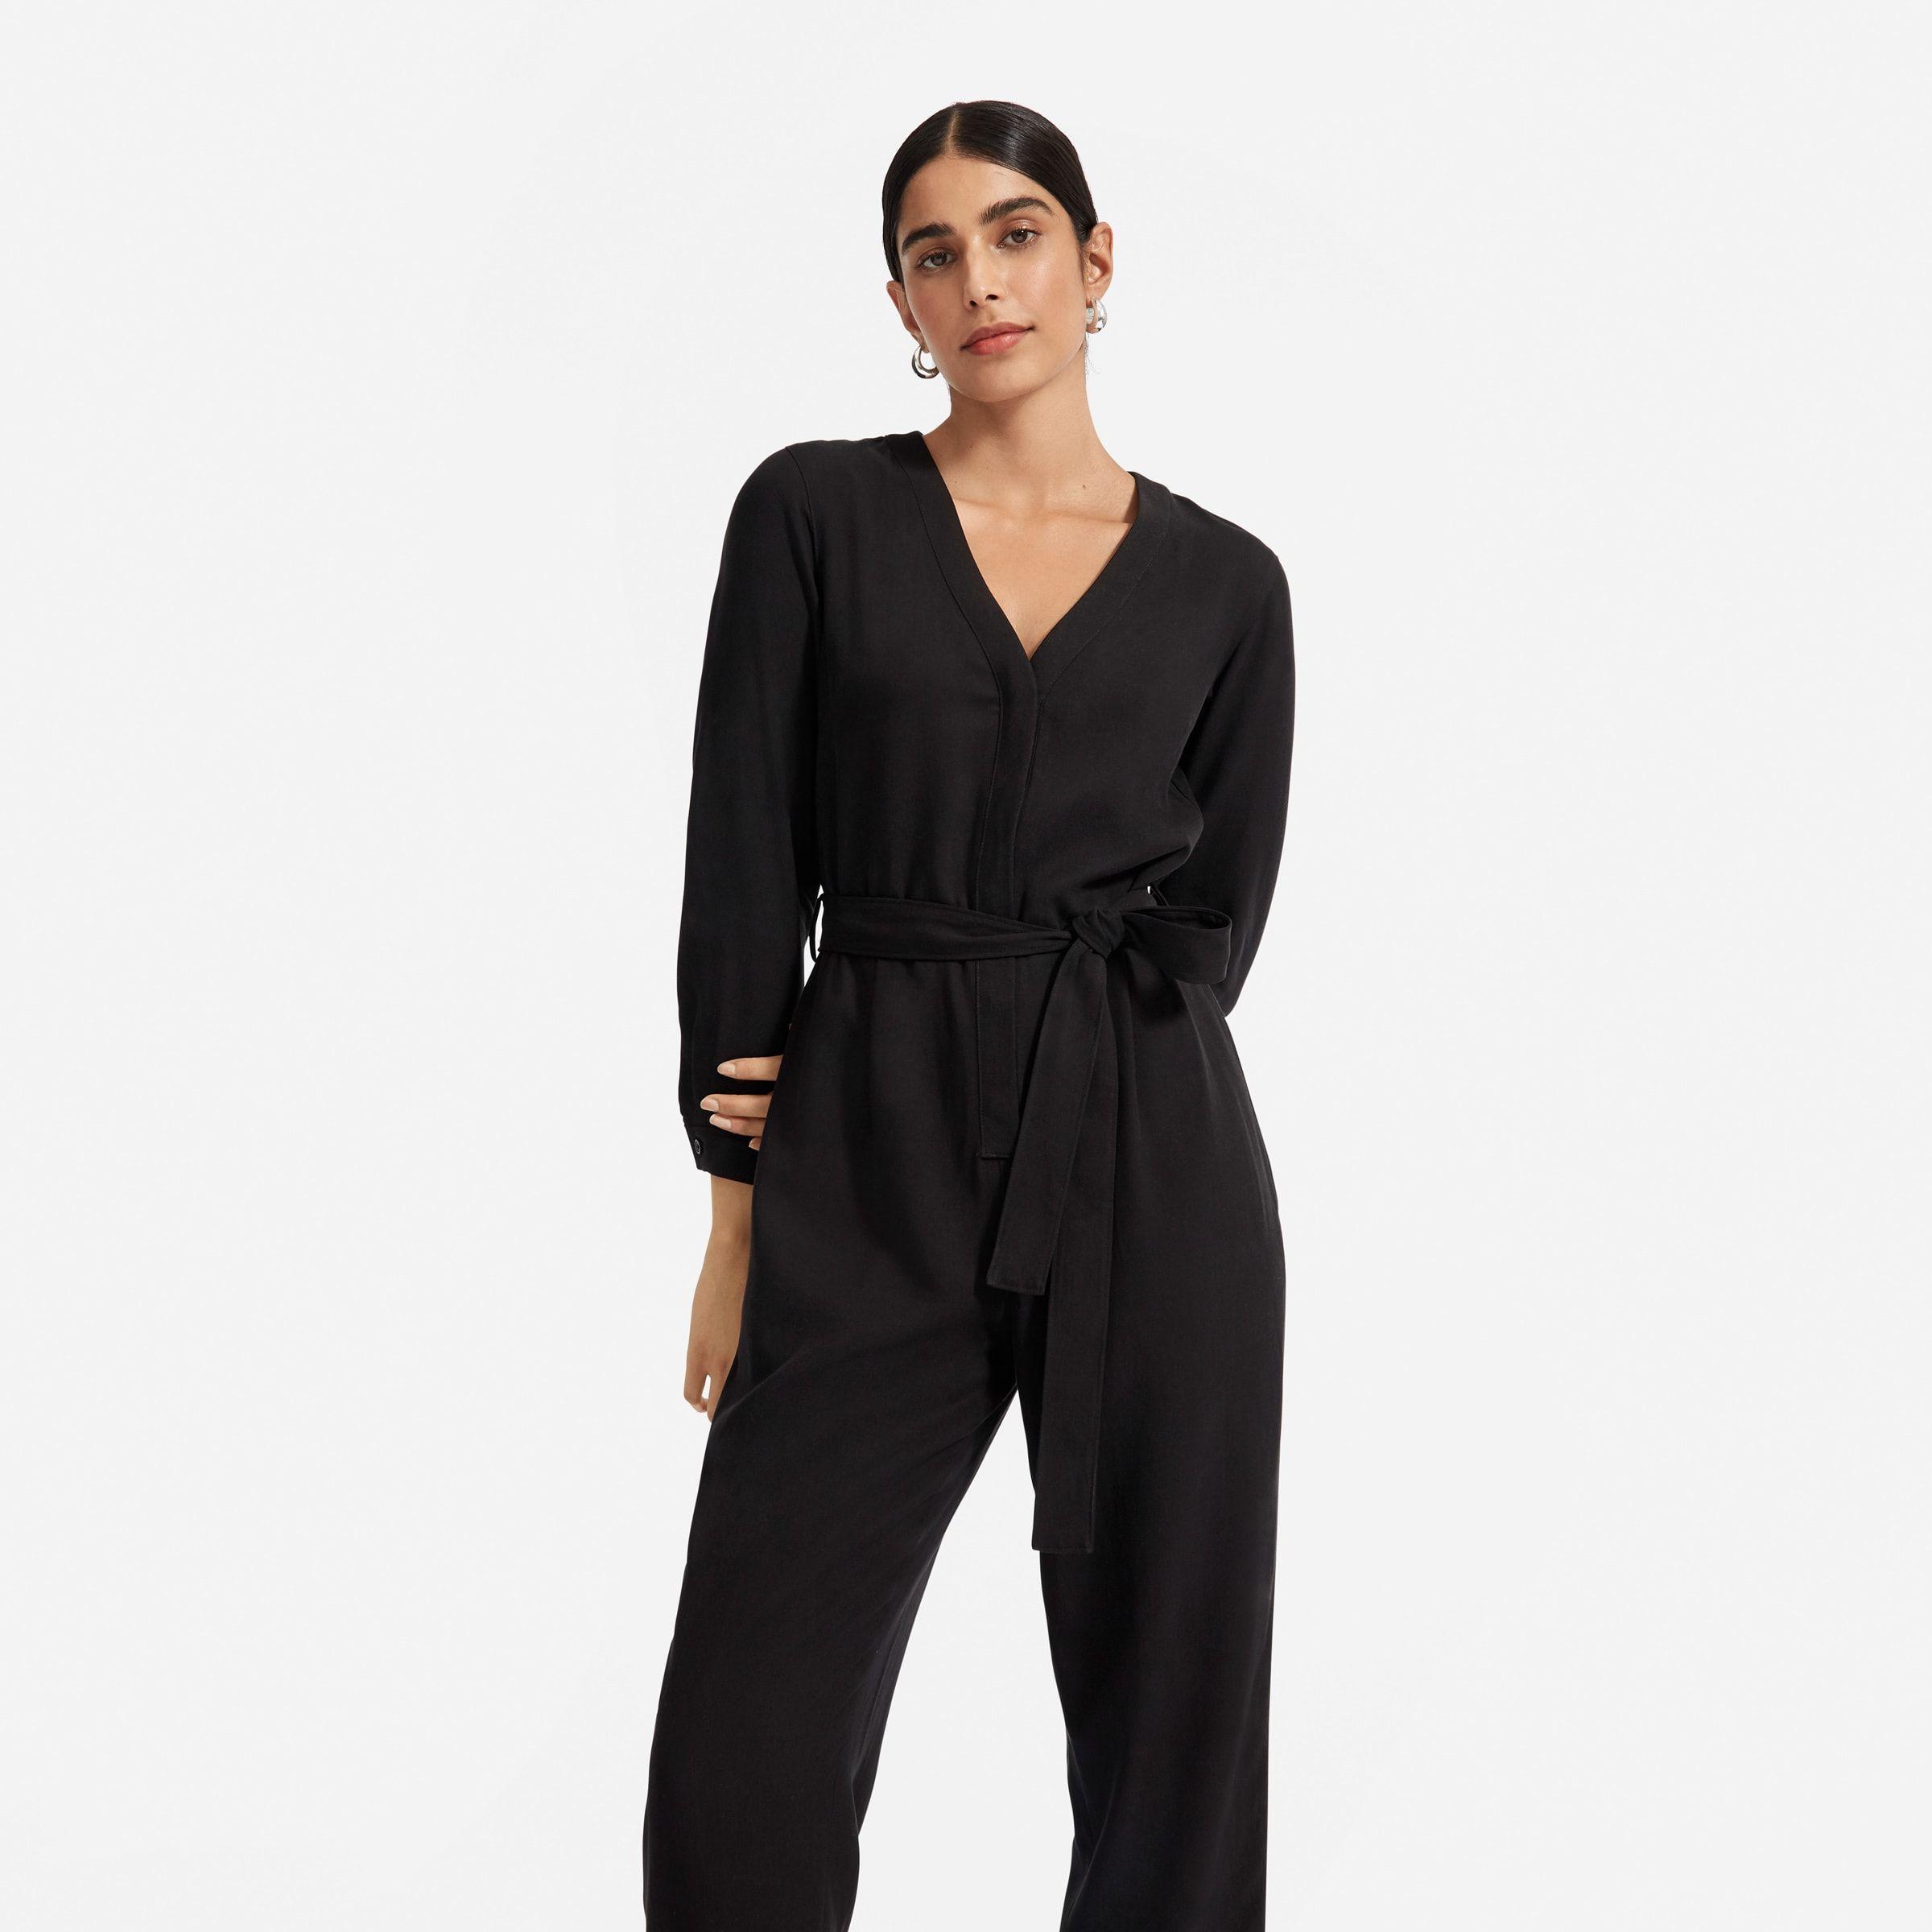 Forget The Little Black Dress The Drape Jumpsuit Features Feminine Blouson Sleeves A Slightly Cropped Hem An Easy Remov Jumpsuit Black Jumpsuit Clothes 2019 [ 2400 x 2400 Pixel ]